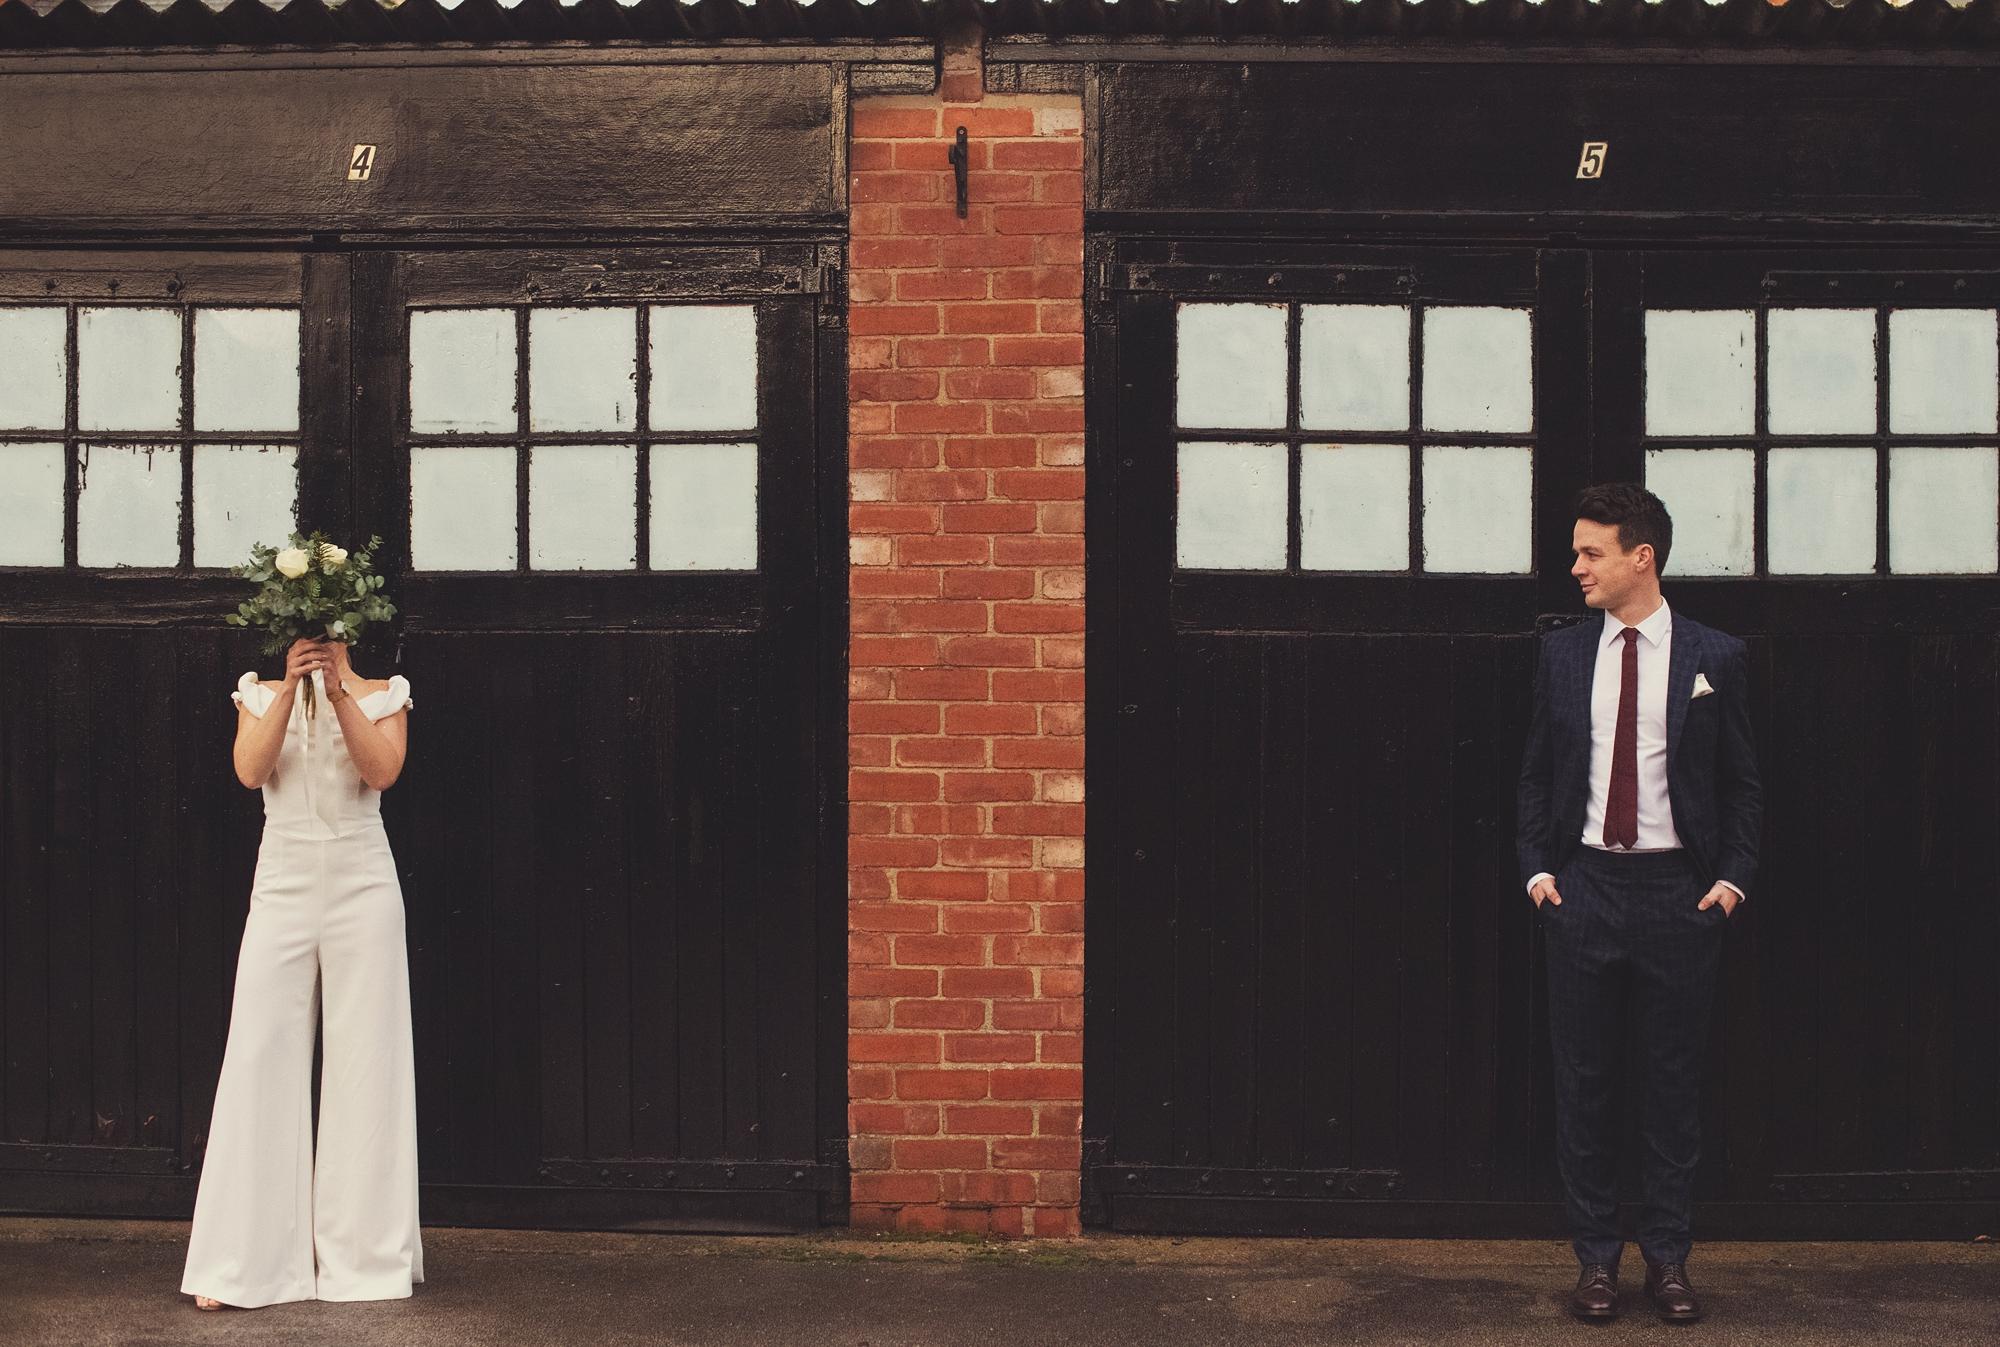 DSC_5762a_yorkshire wedding photographer.jpg